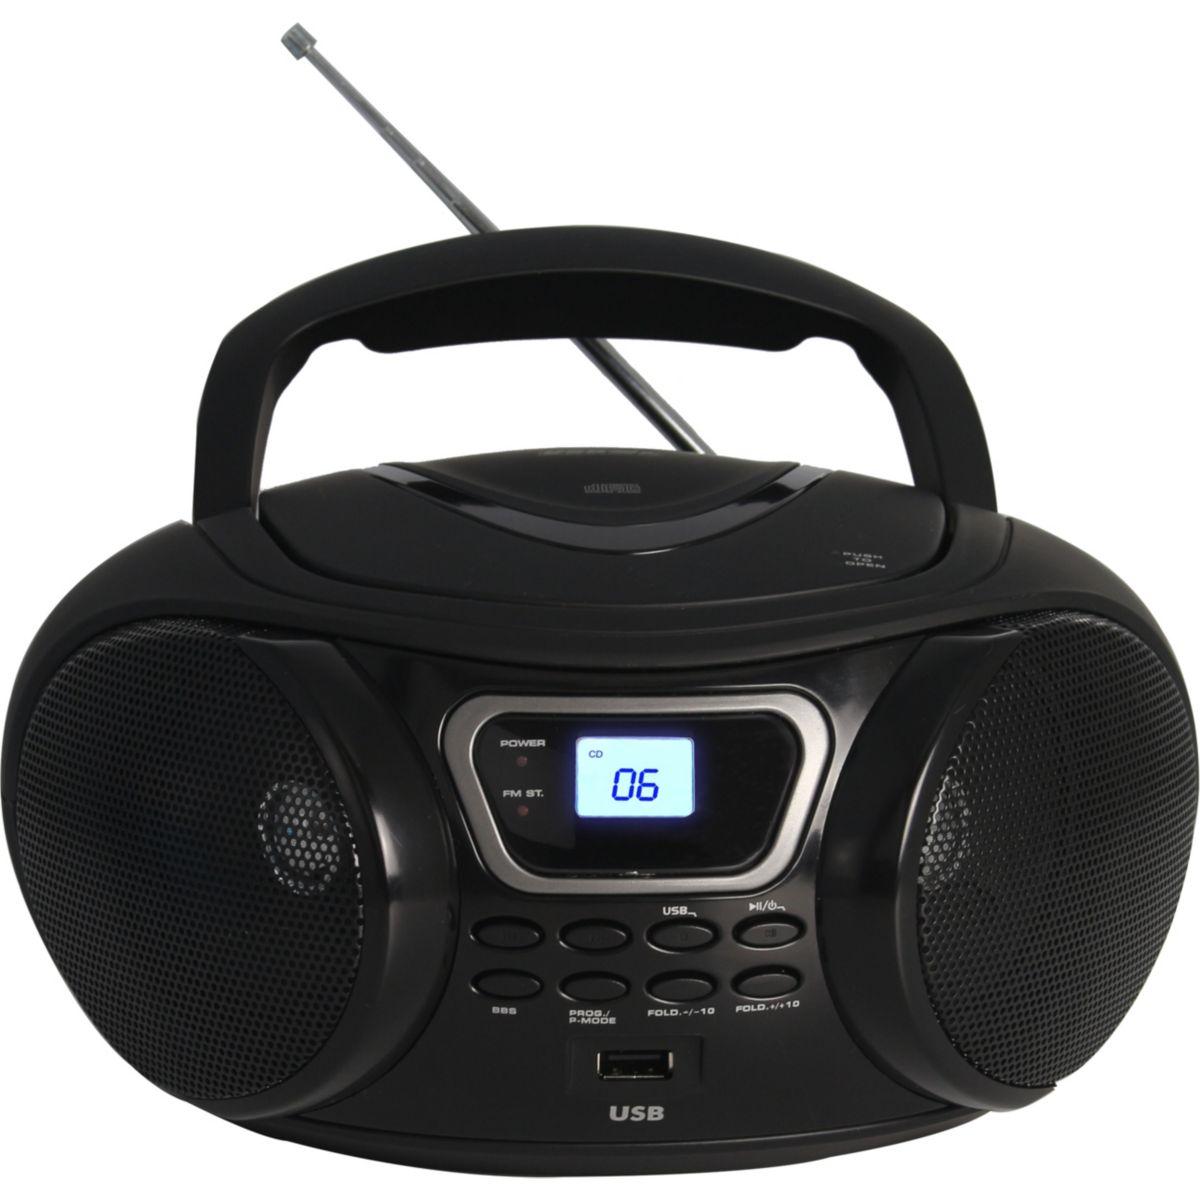 Radio CD ESSENTIELB Rumba USB MP3 Noir